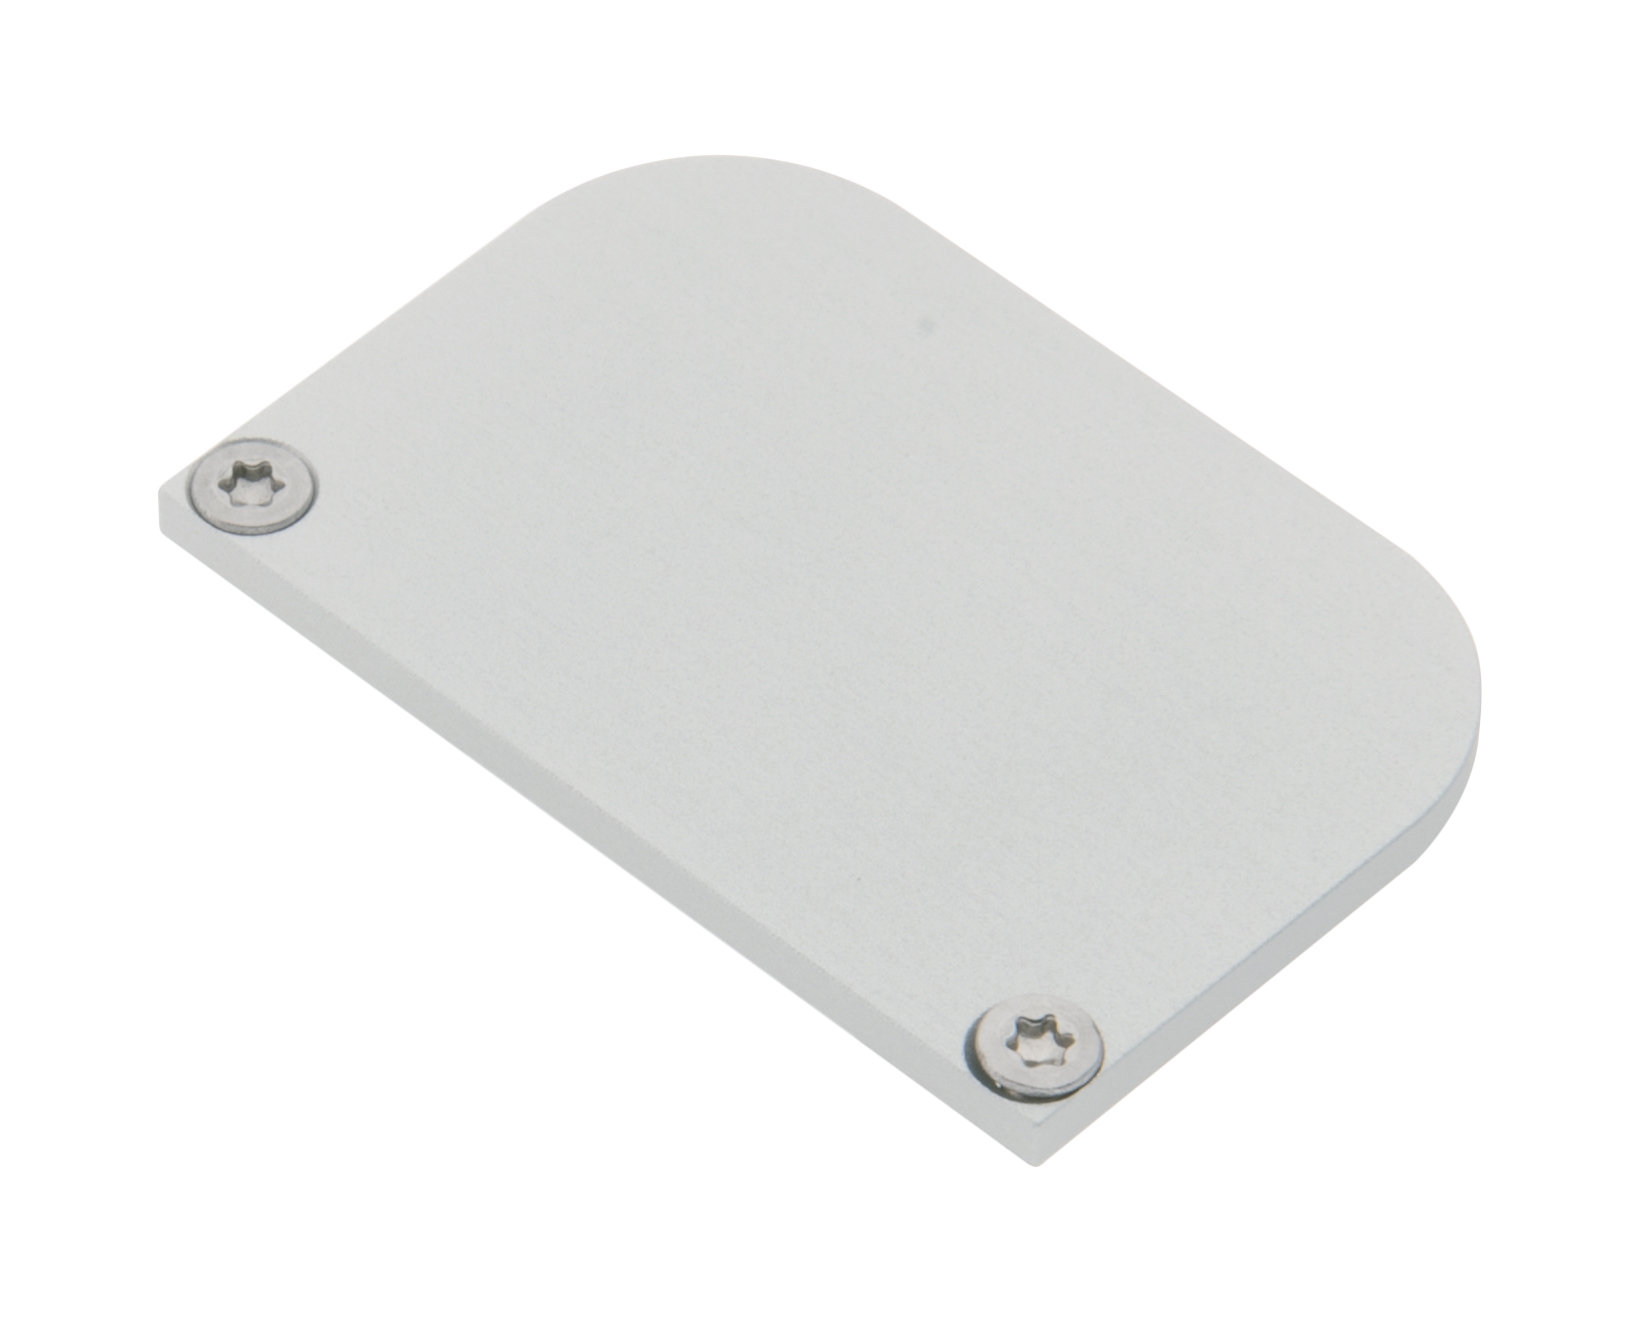 1 Stk Profil Endkappe MFF Rund geschlossen inkl. Schrauben LIEK005410